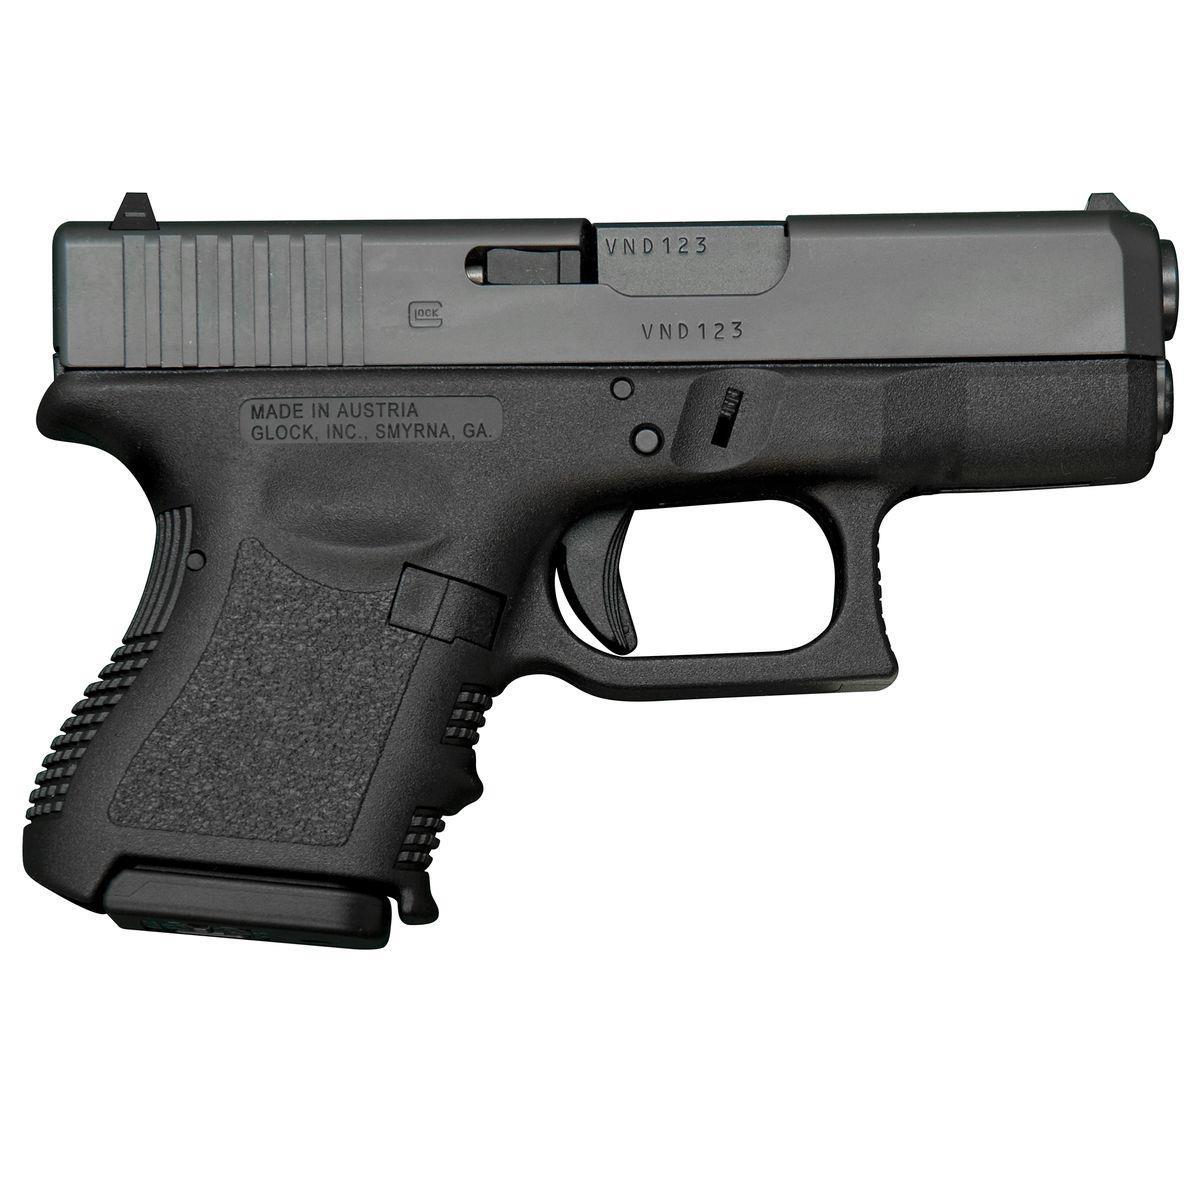 Glock 26 Gen 4 9mm 10rd Pistol Hunter S Refuge